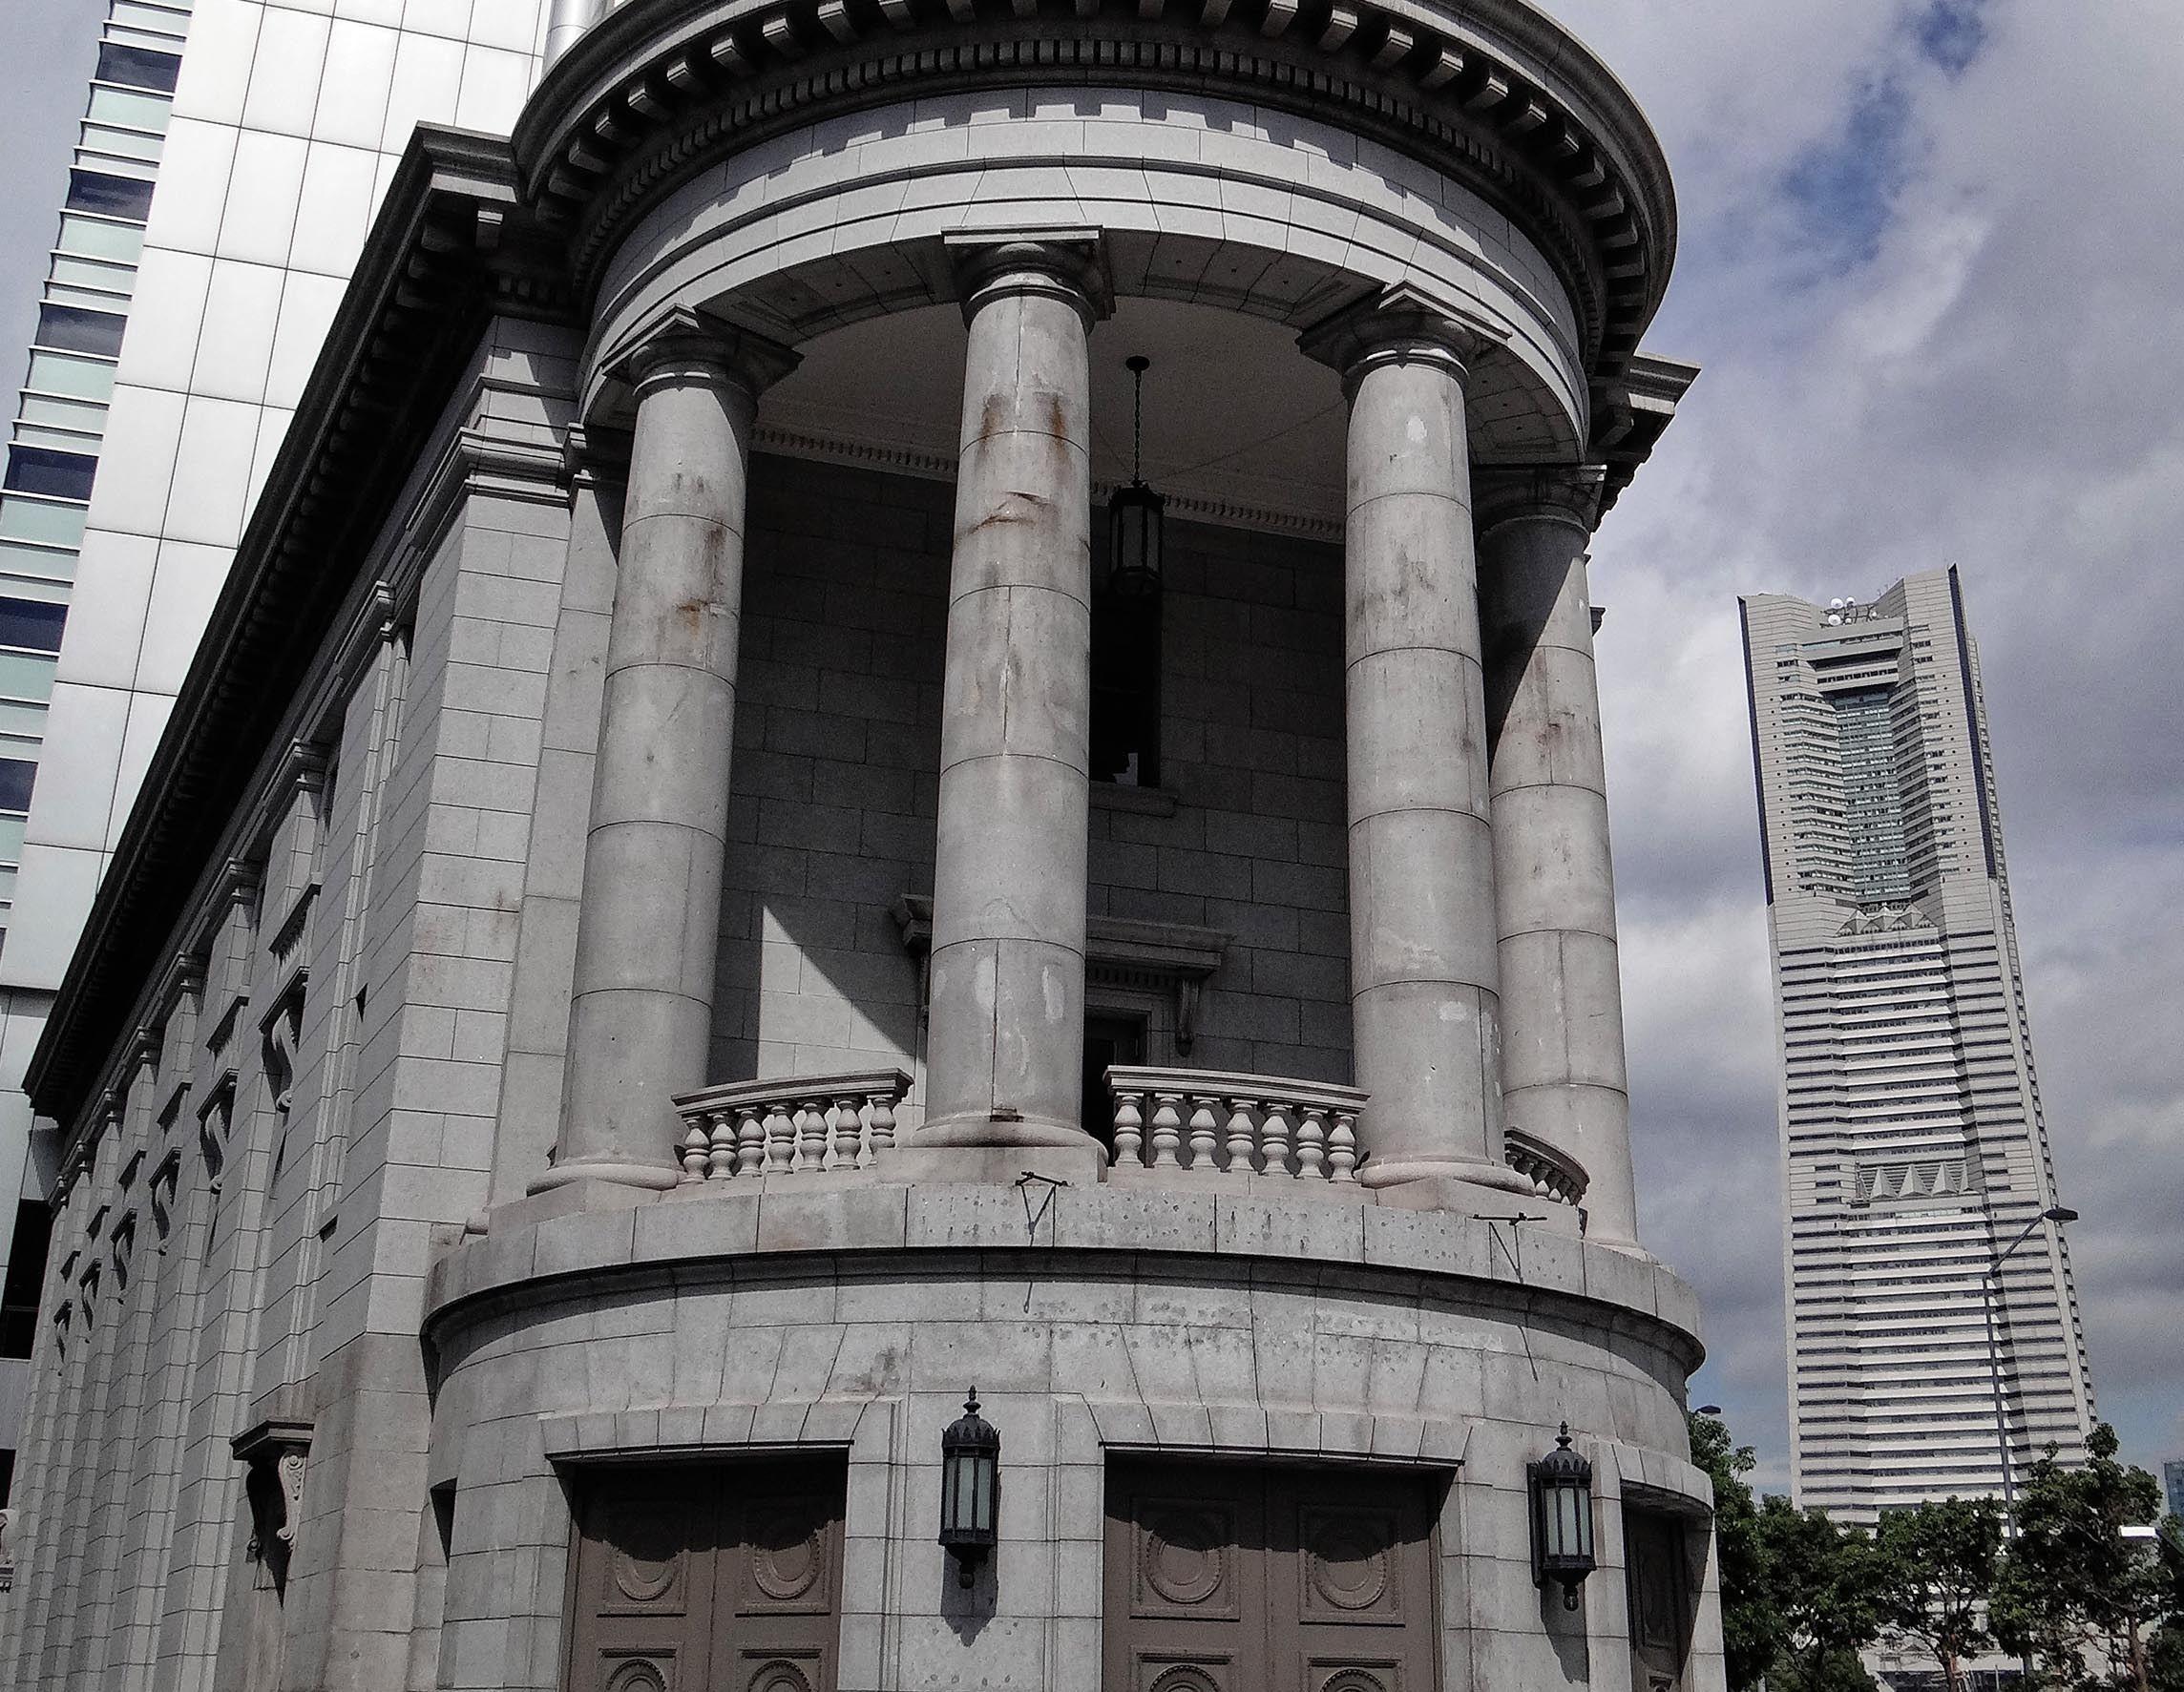 【横浜銀行】実は日本初の金融組織|ご当地銀行の合従連衡史